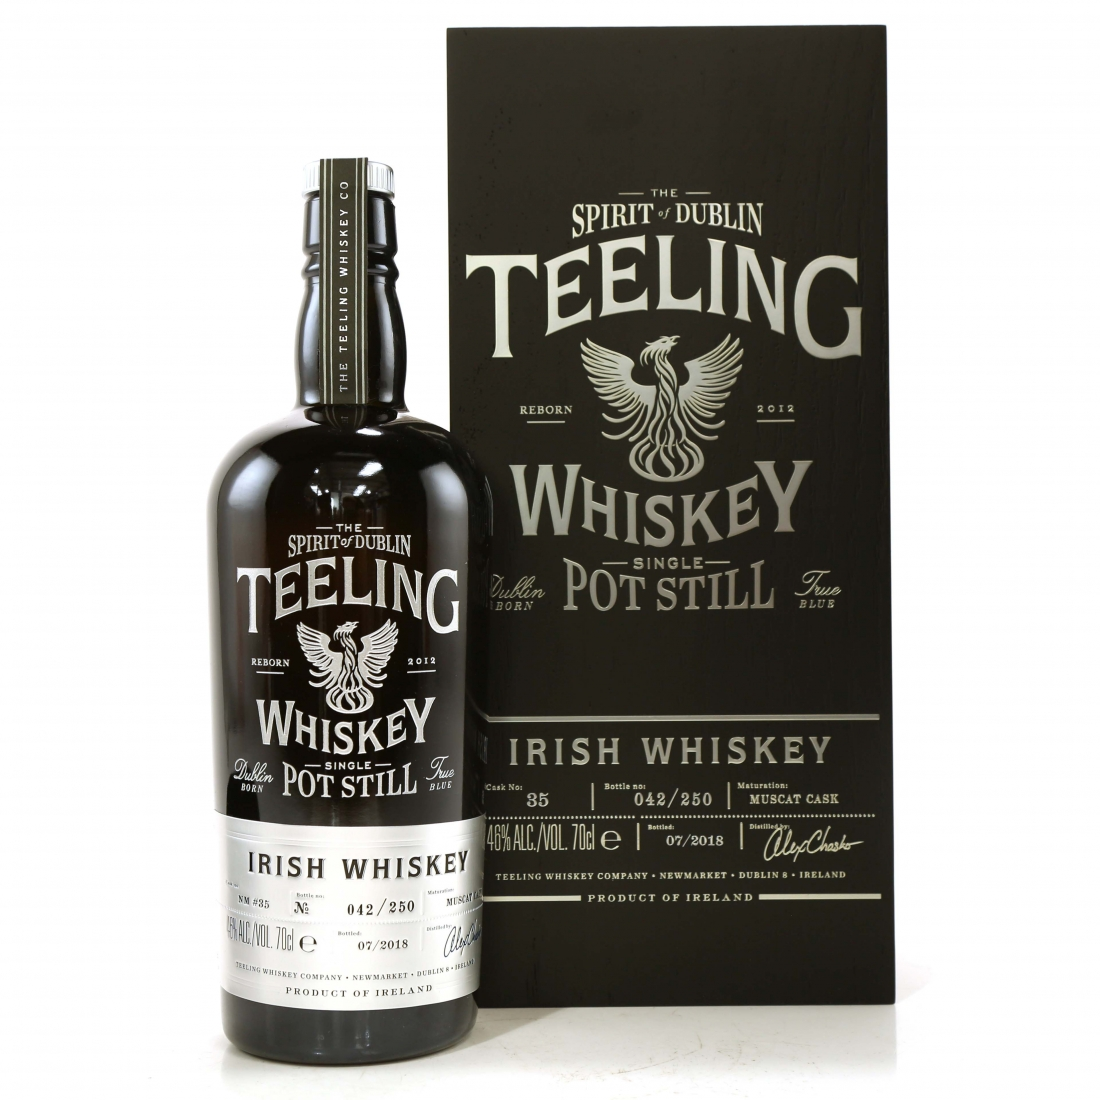 Teeling Celebratory Single Pot Still Whiskey / Bottle #042